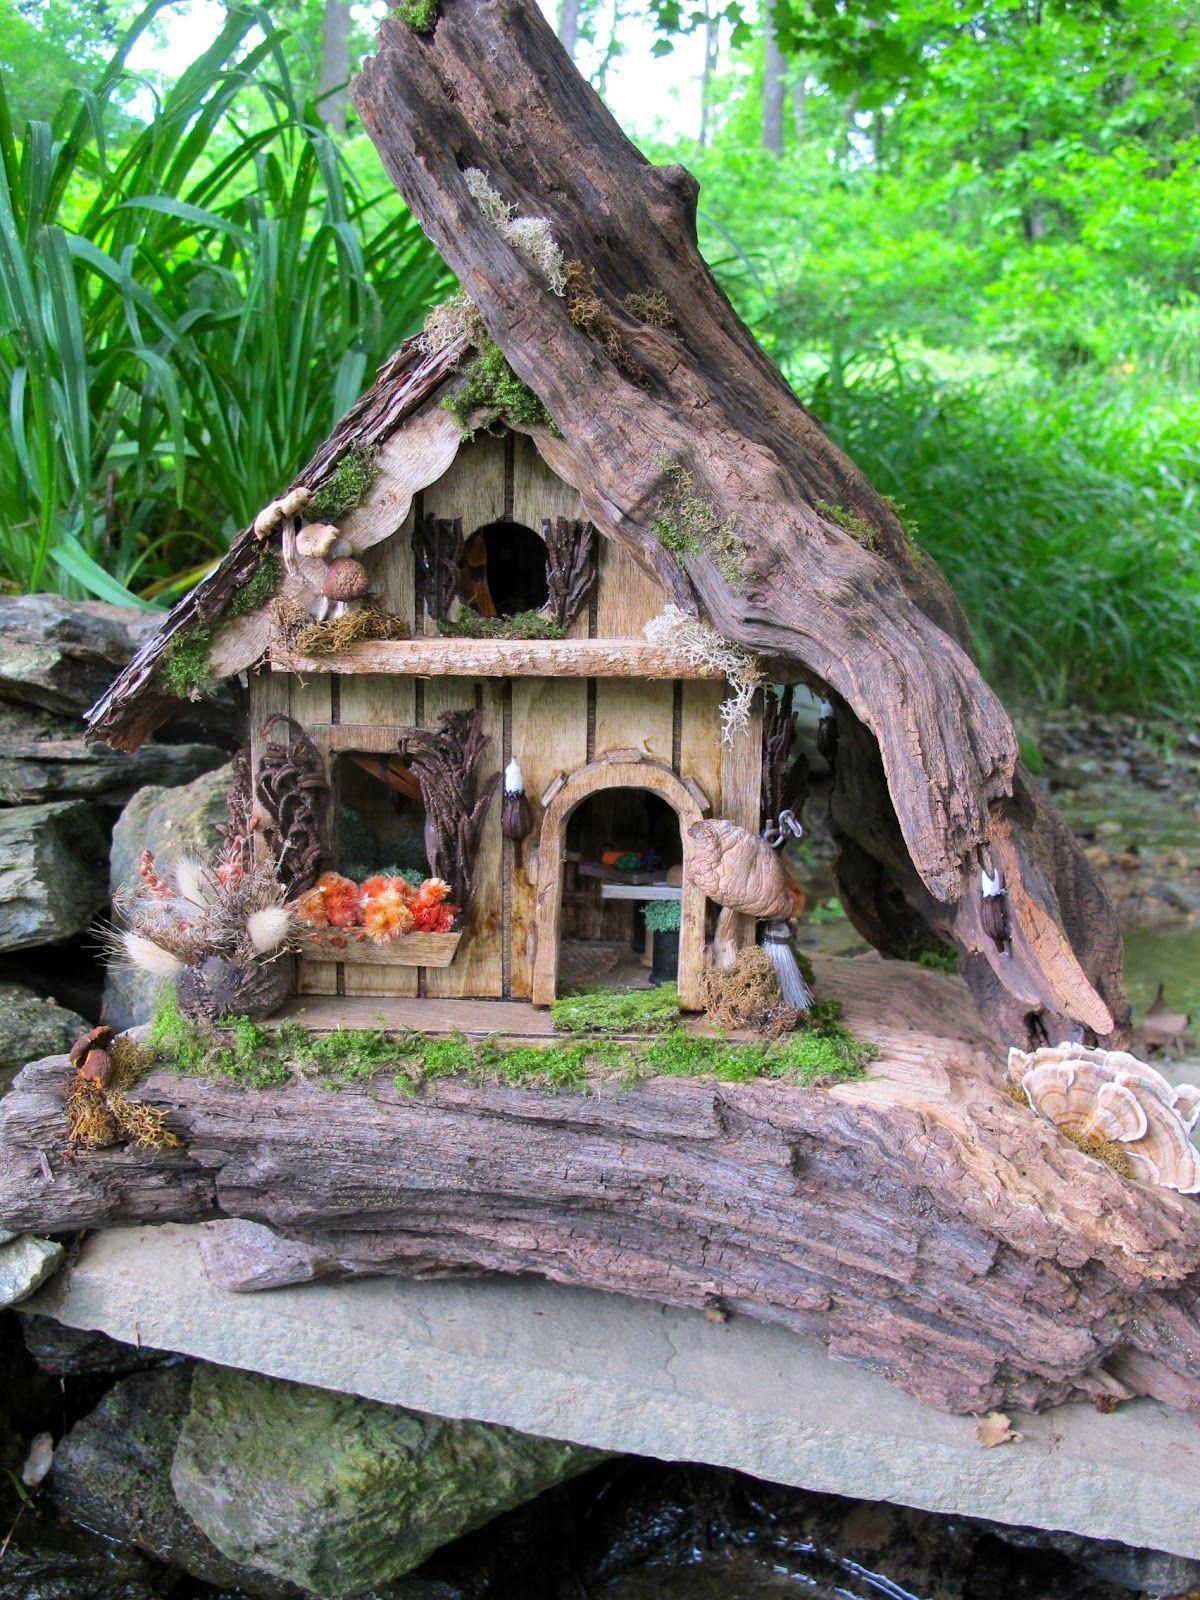 Whimsical Properties Custom Made Fairy Houses Casas En 400 x 300